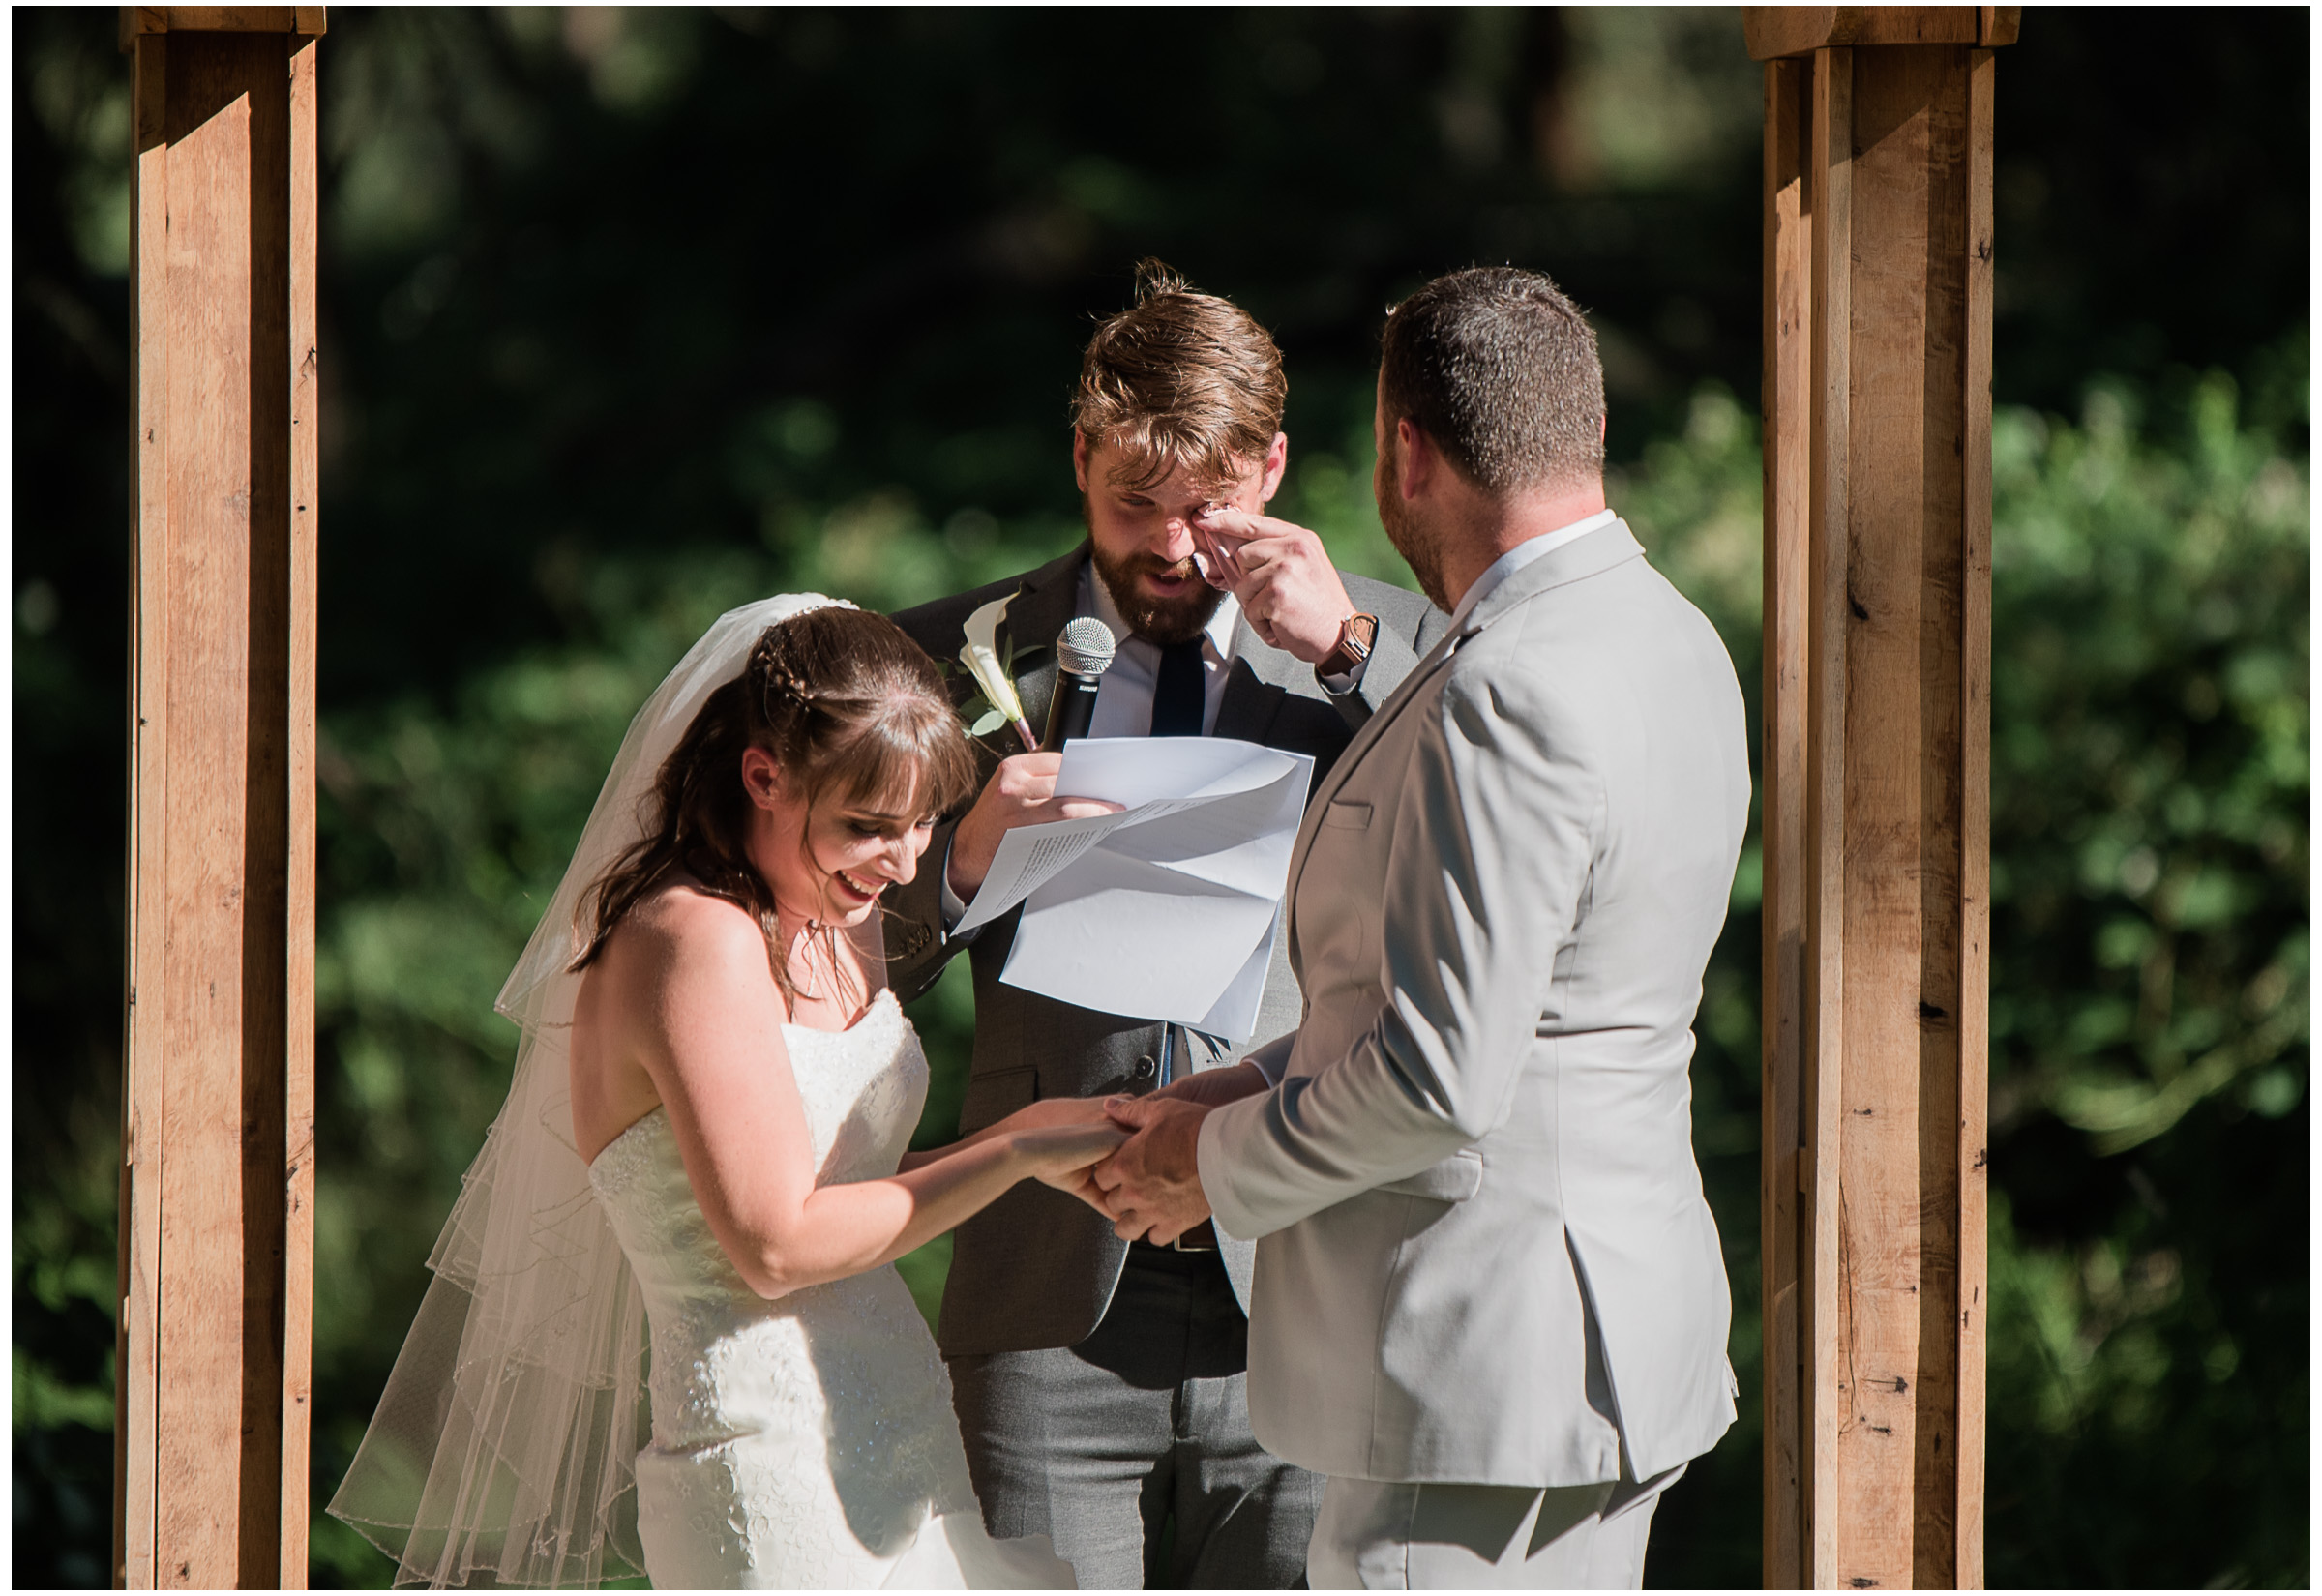 Placerville Wedding - Sacramento Photographer - Justin Wilcox Photography - 9.jpg